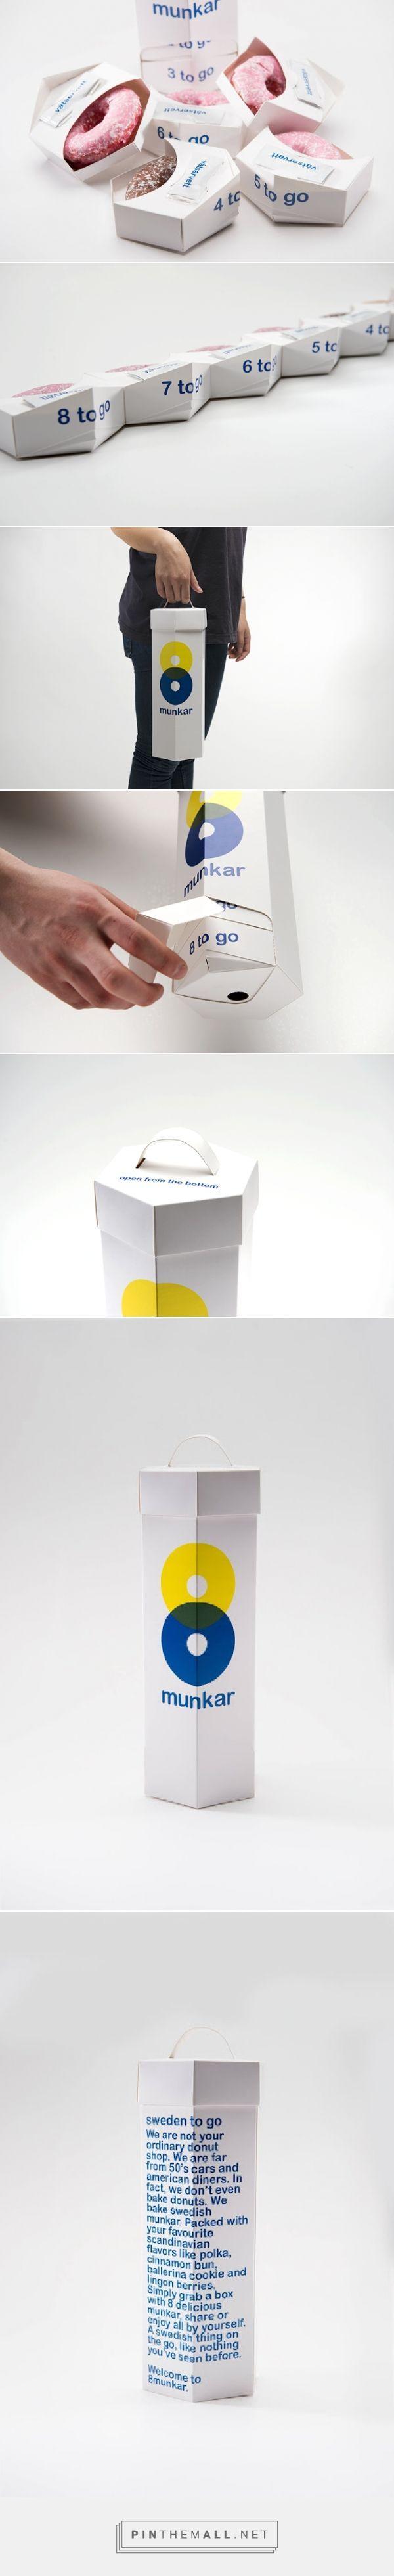 8munkar Donuts - Student concept packaging designed by Emelie Johannesson & Oliver Sjöqvist - http://www.packagingoftheworld.com/2015/06/8munkar-student-project.html